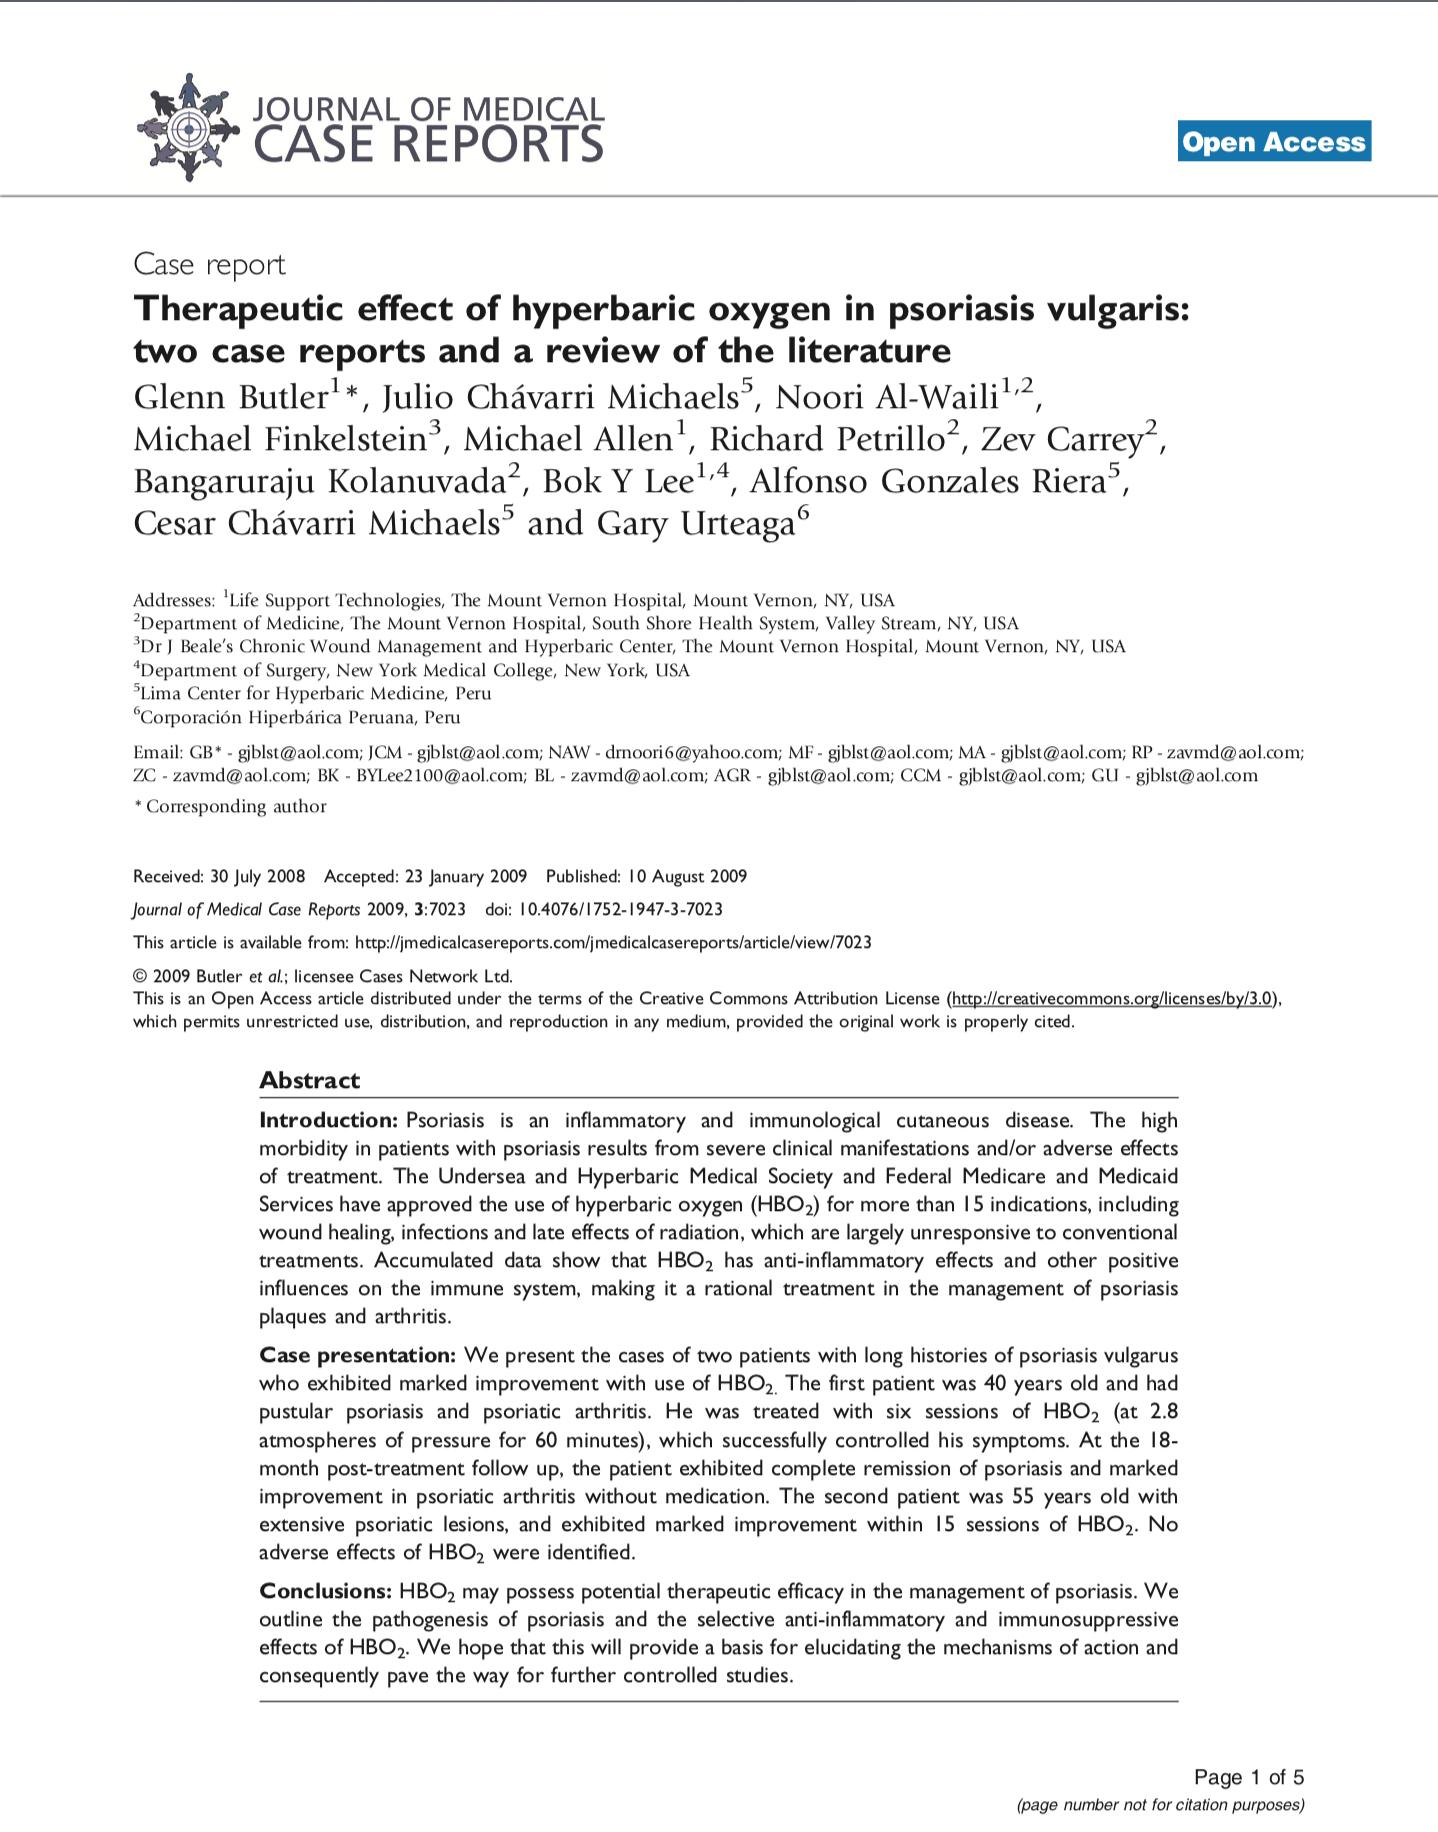 A New Treatment Modality for Fibromyalgia Syndrome Hyperbaric Oxygen Therapy